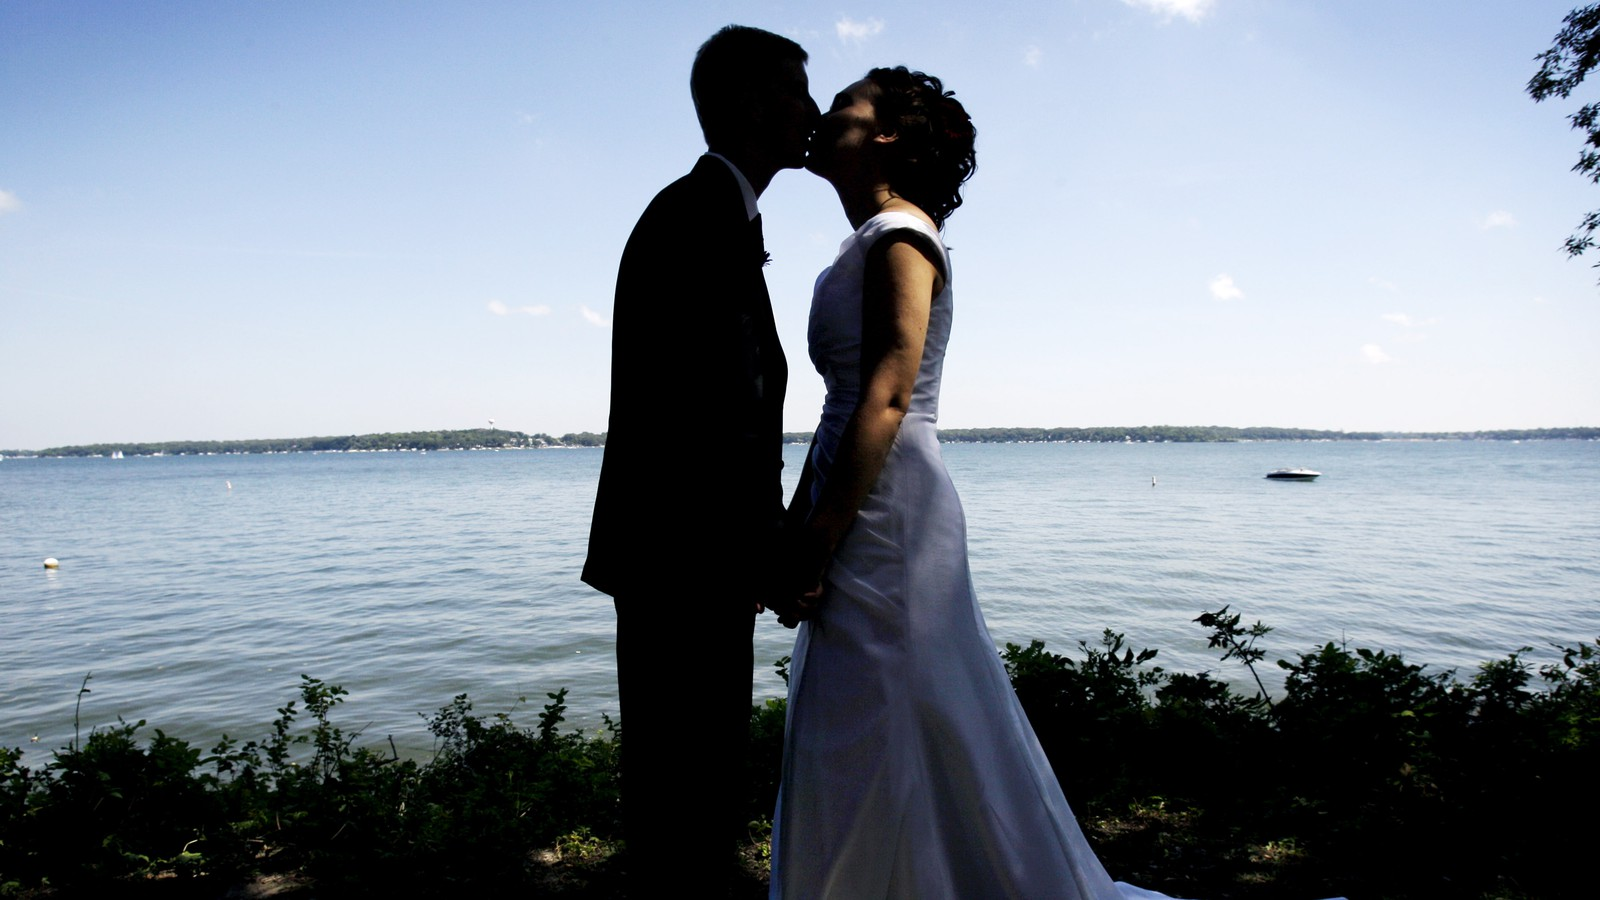 On wife day cheats wedding 'Why I